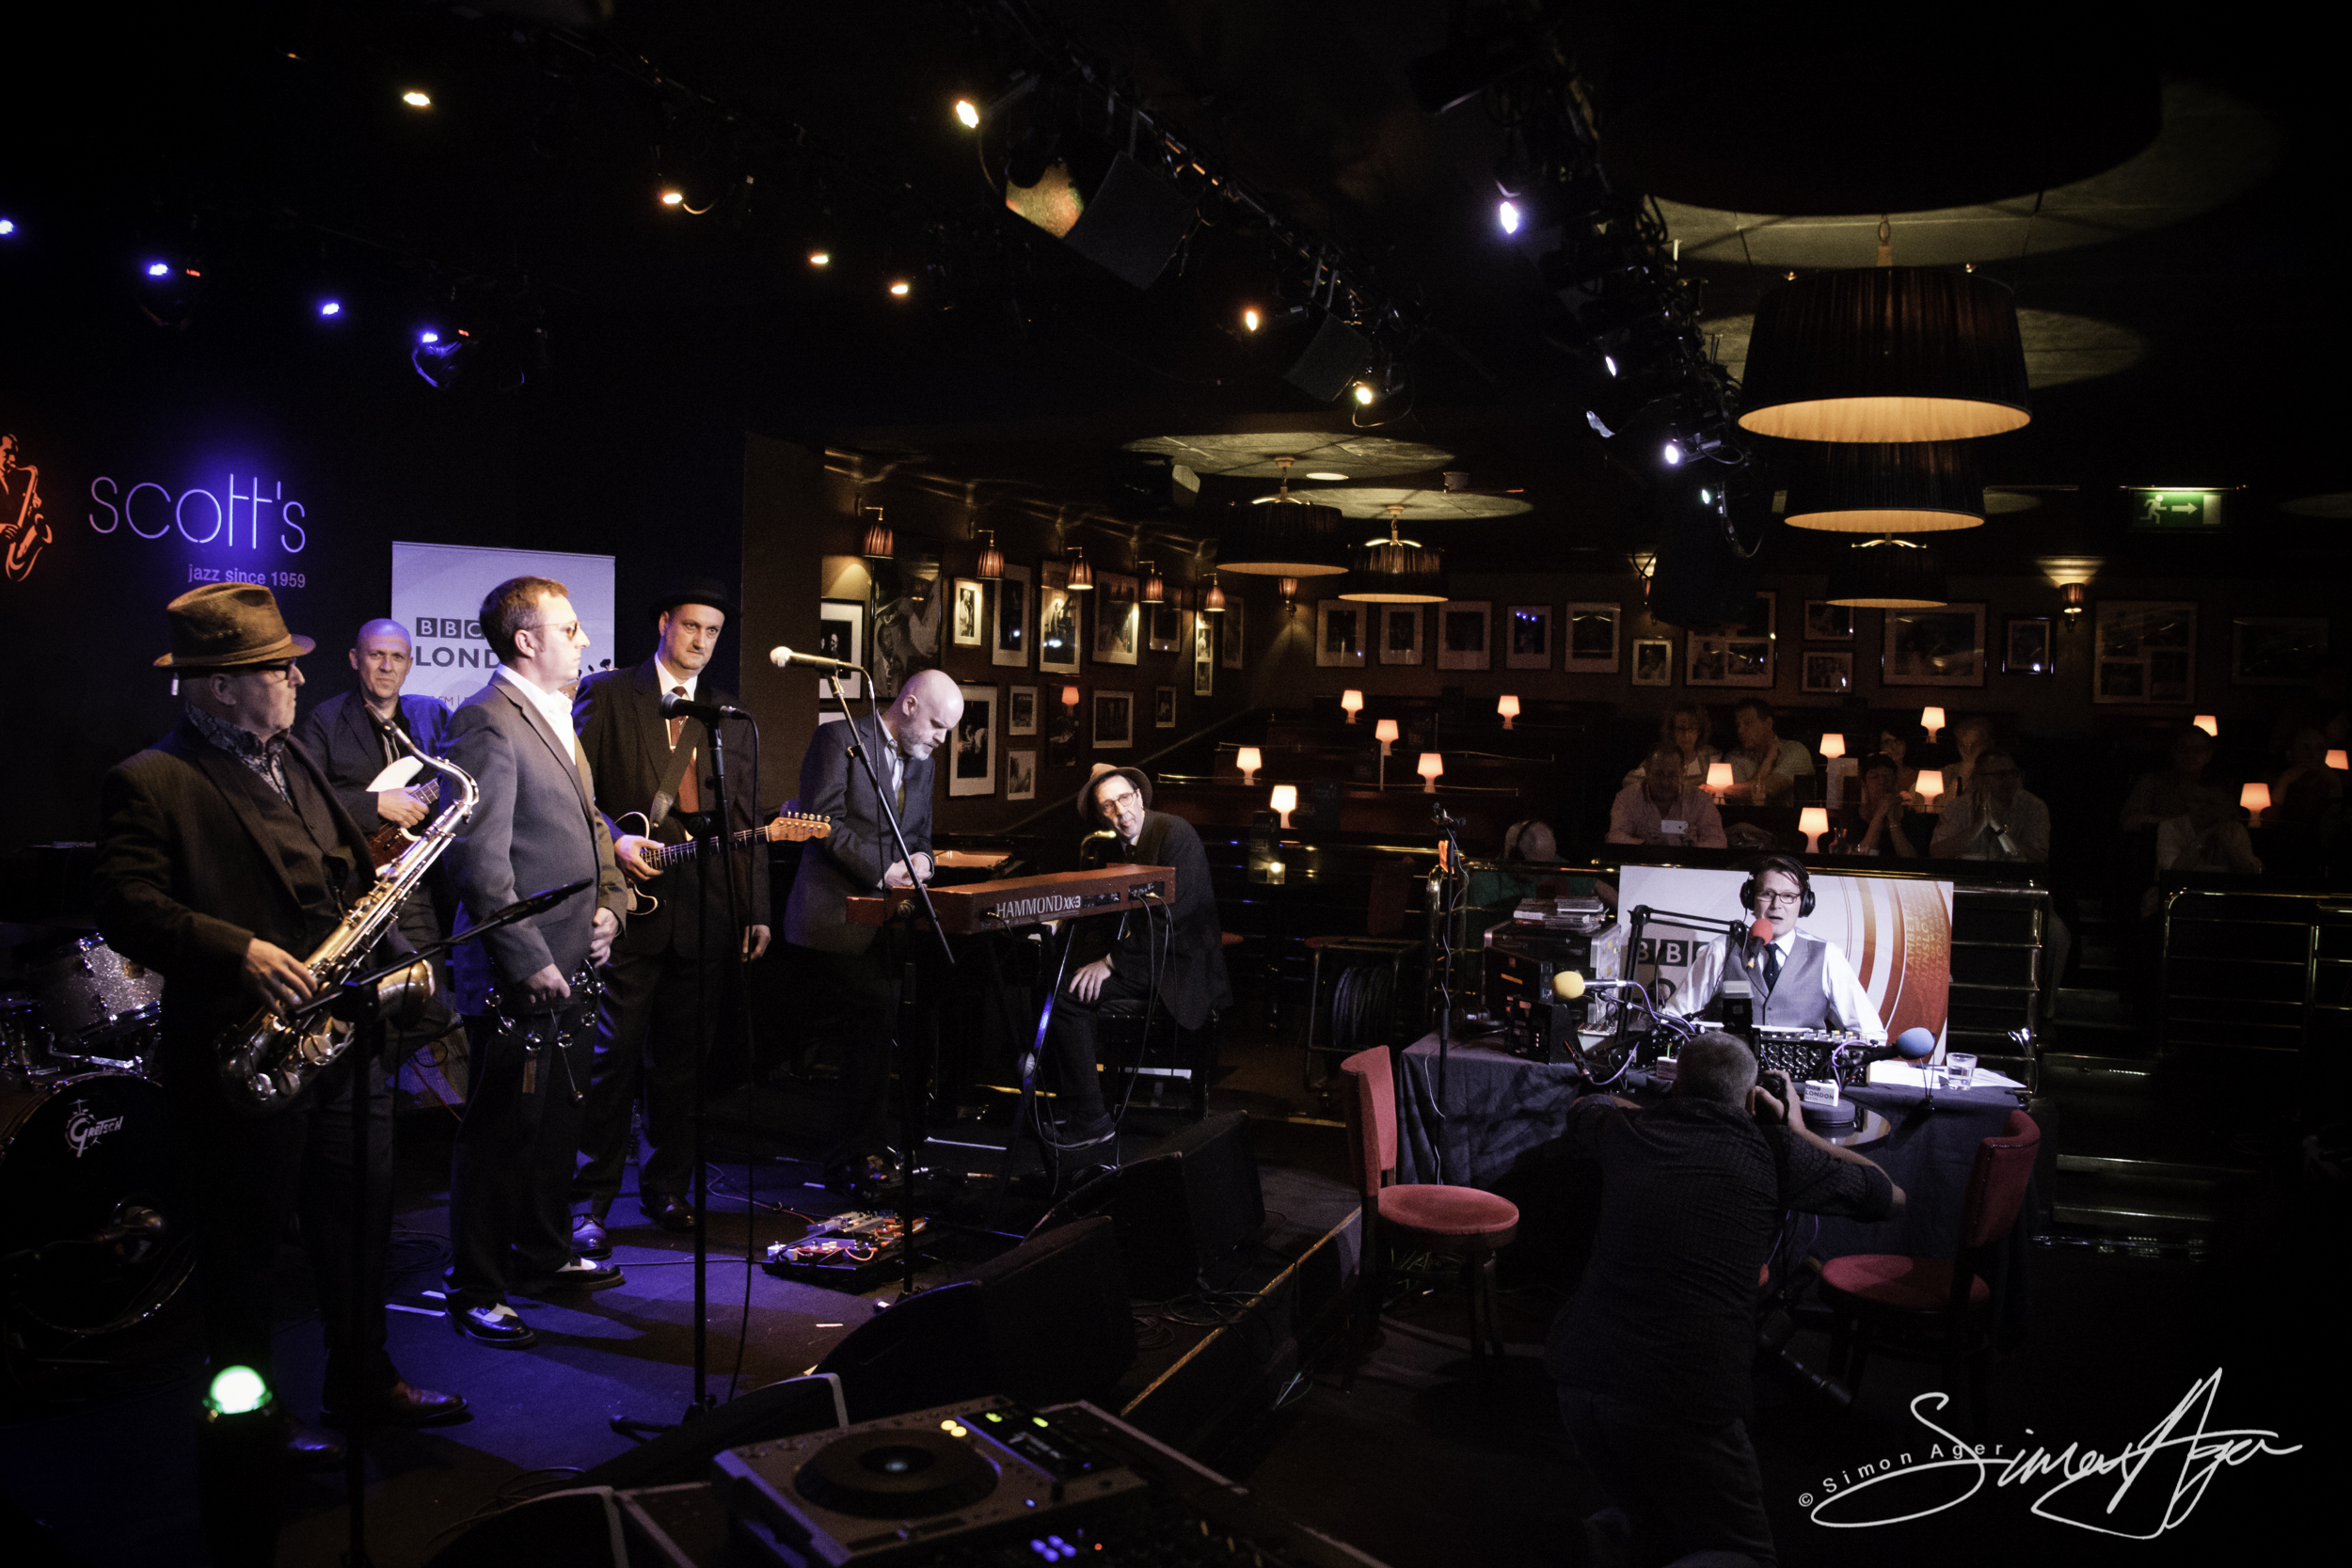 140620-SA-025-TLTSO Ronnie Scotts BBC London Gig -8294